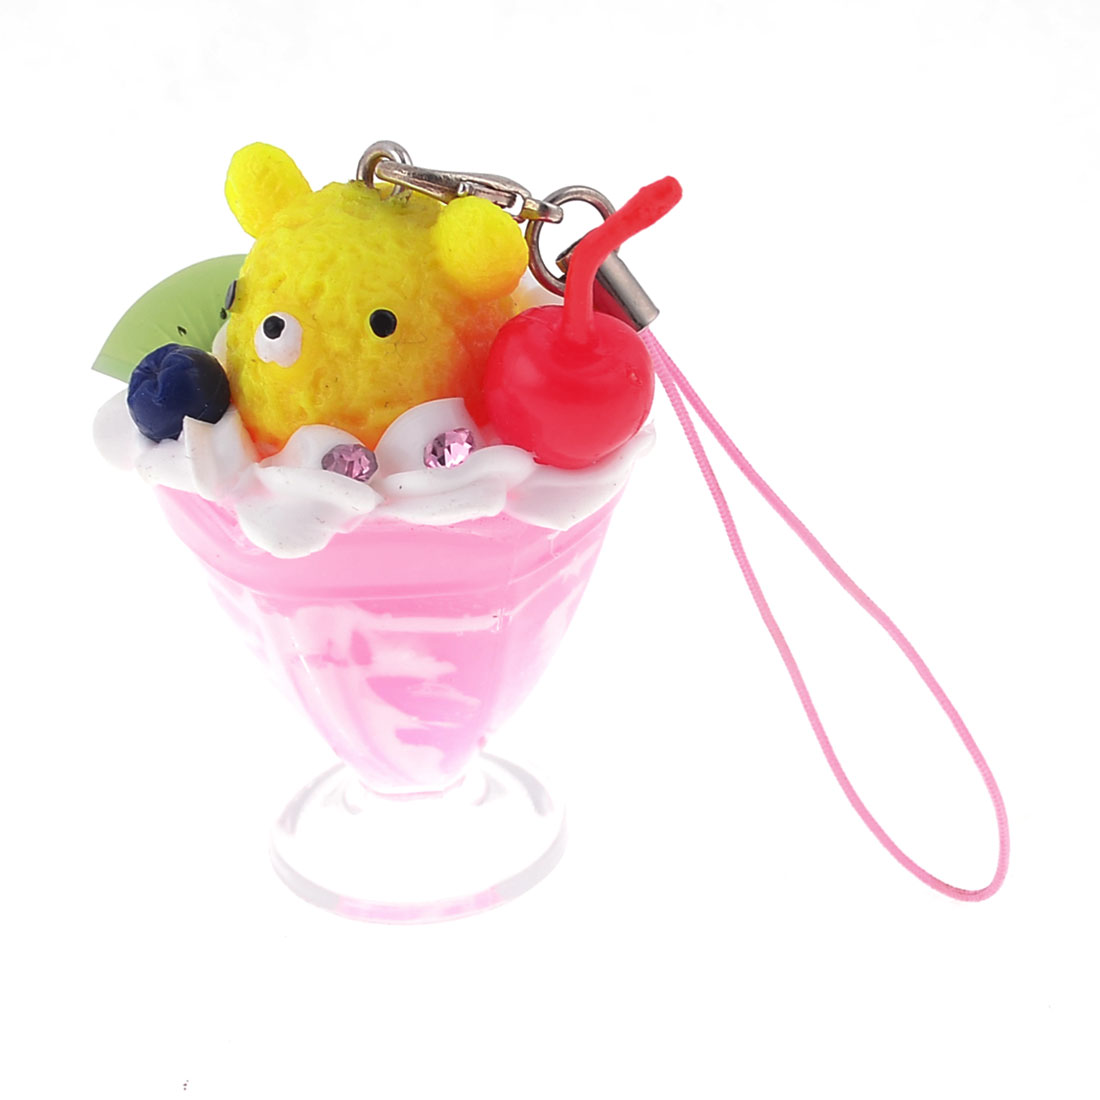 Glitter Rhinestones Inlaid Pink Yellow Ice Cream Cup for Phone Charm Strip